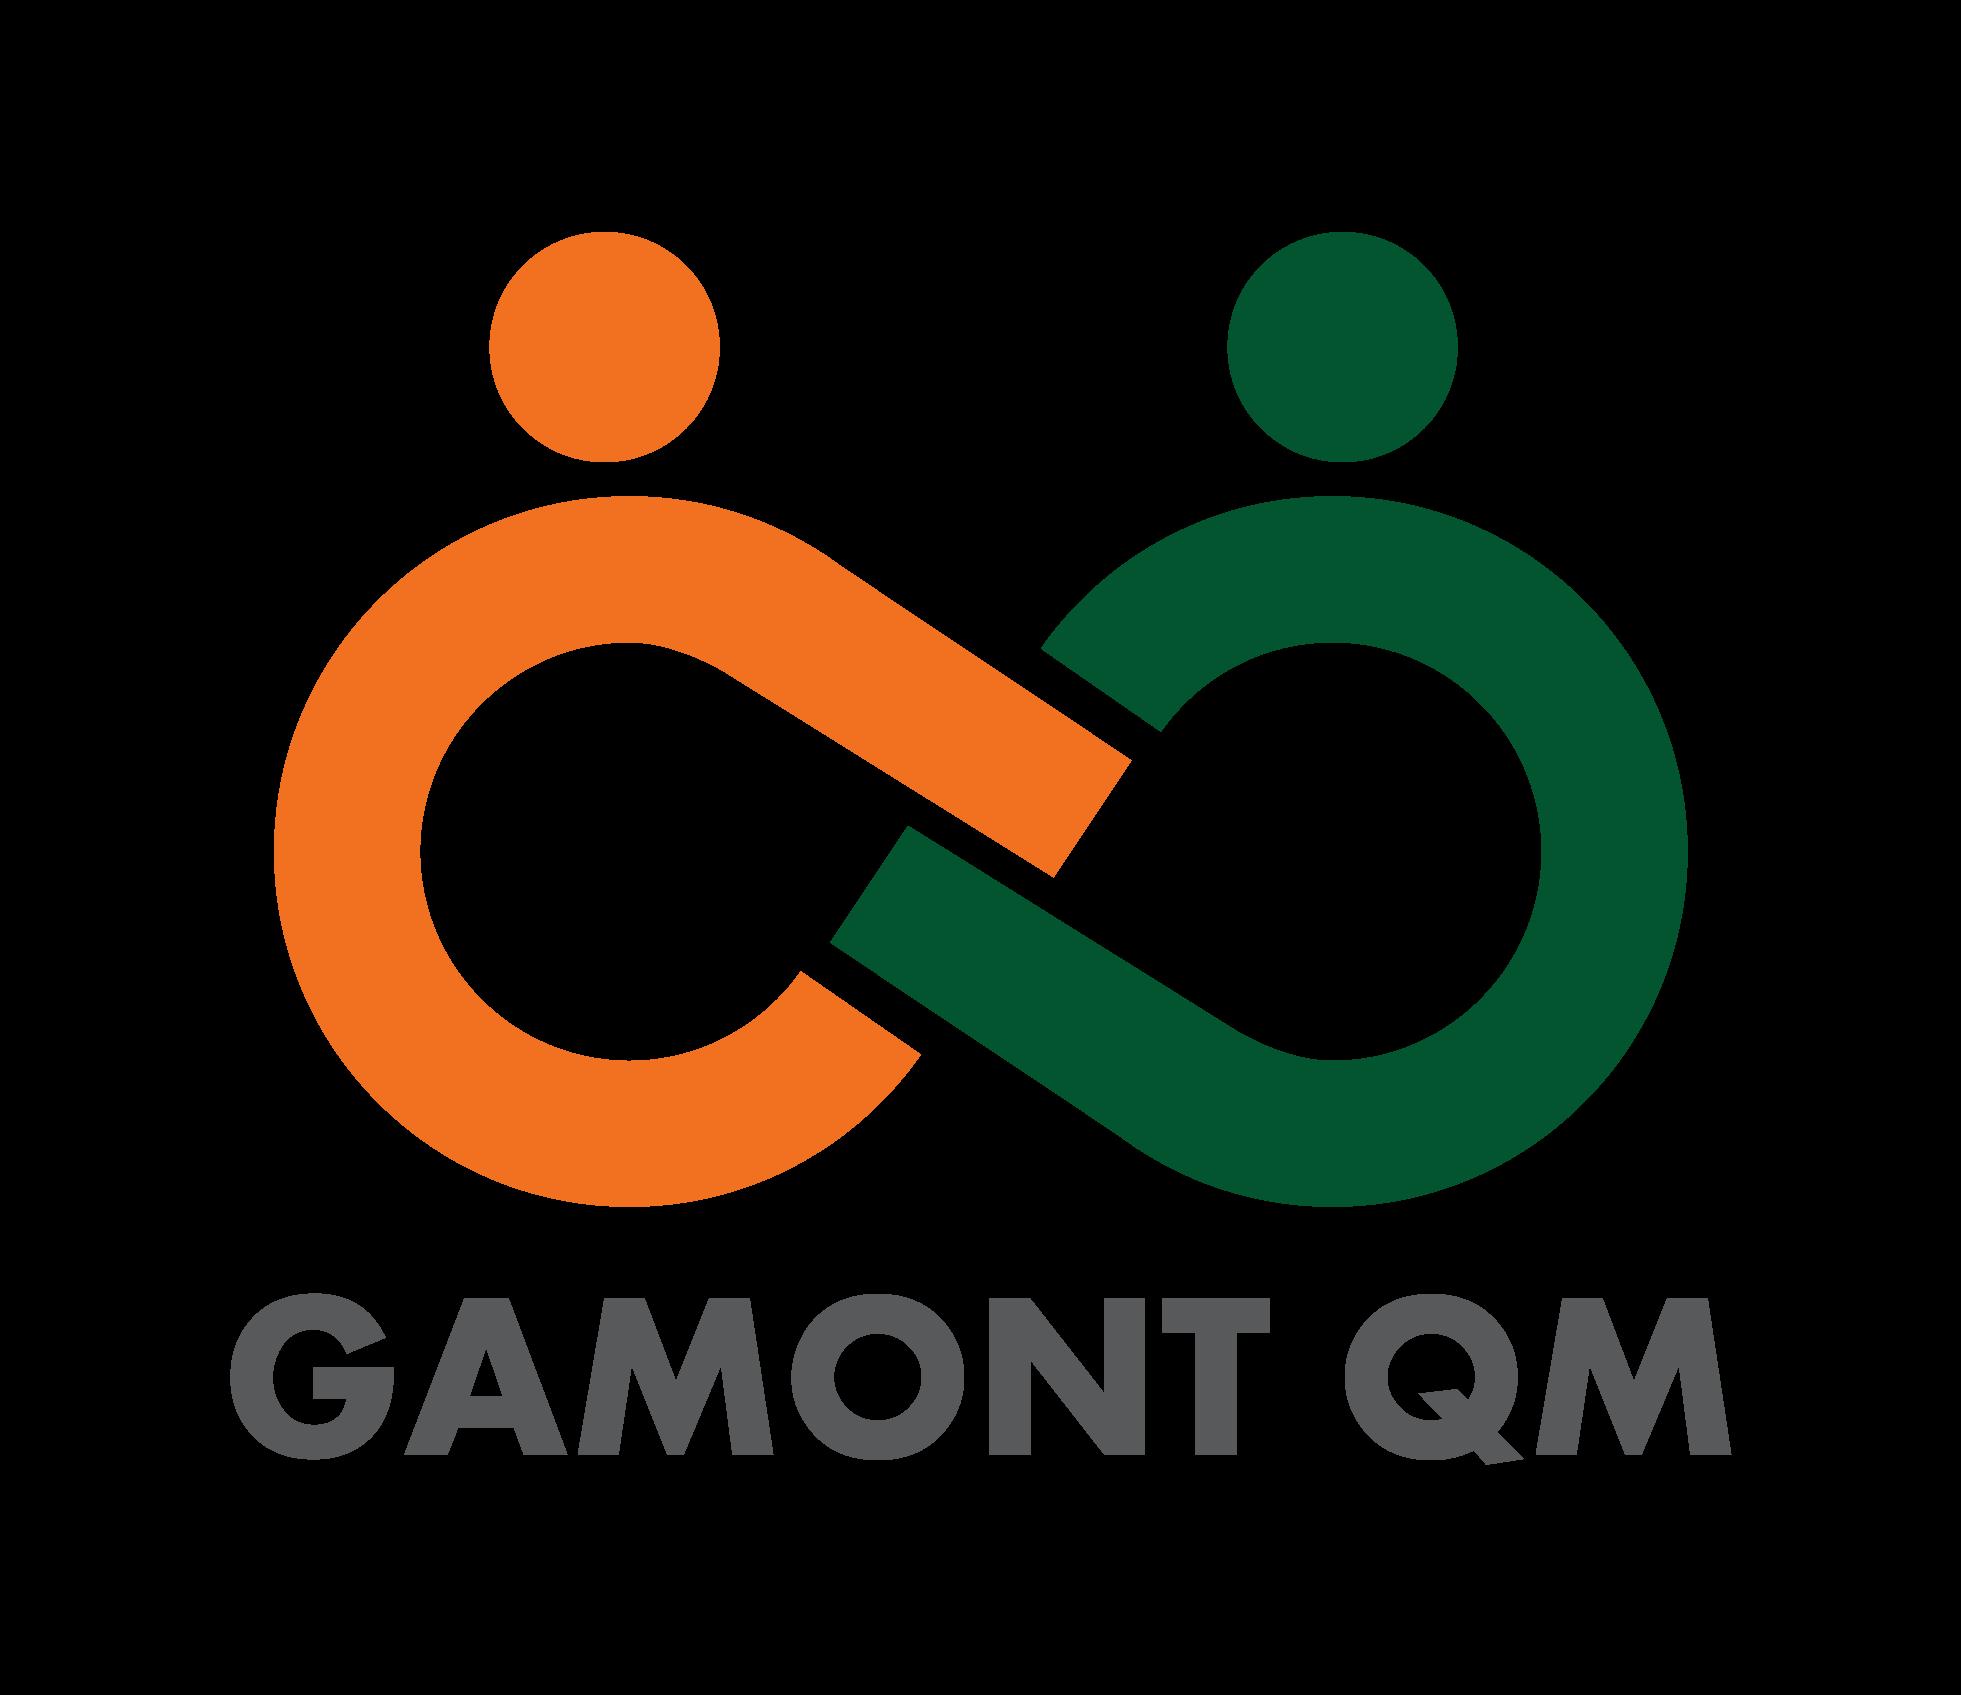 GAMONT QM